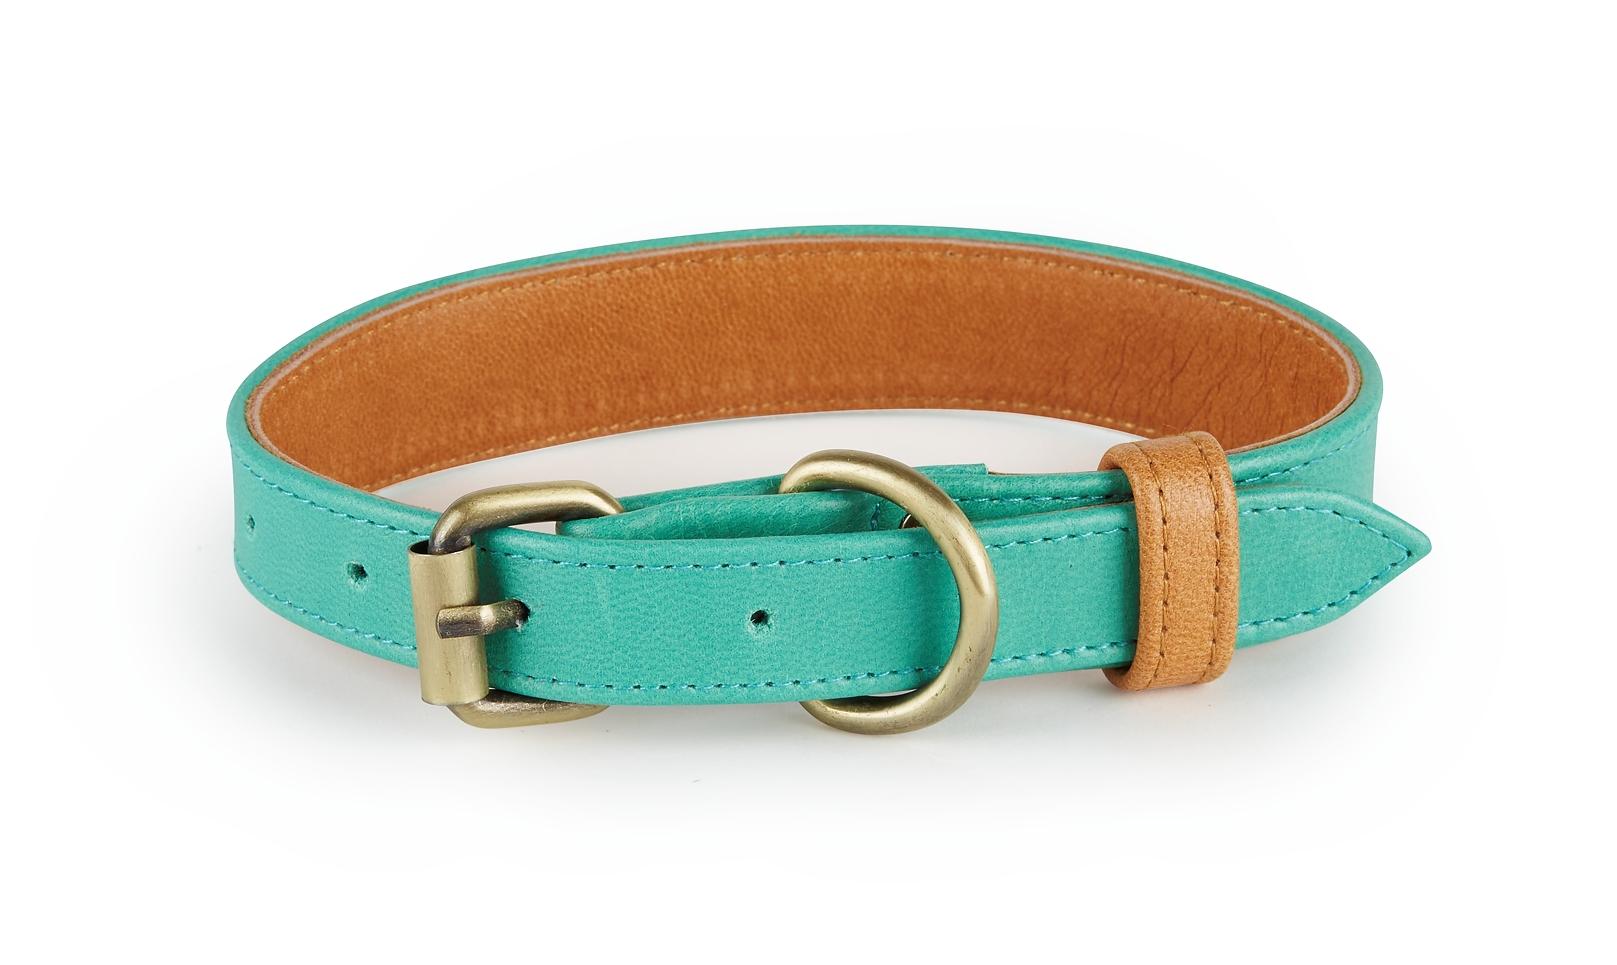 Laguna Turquoise and Tan Leather Dog Collar